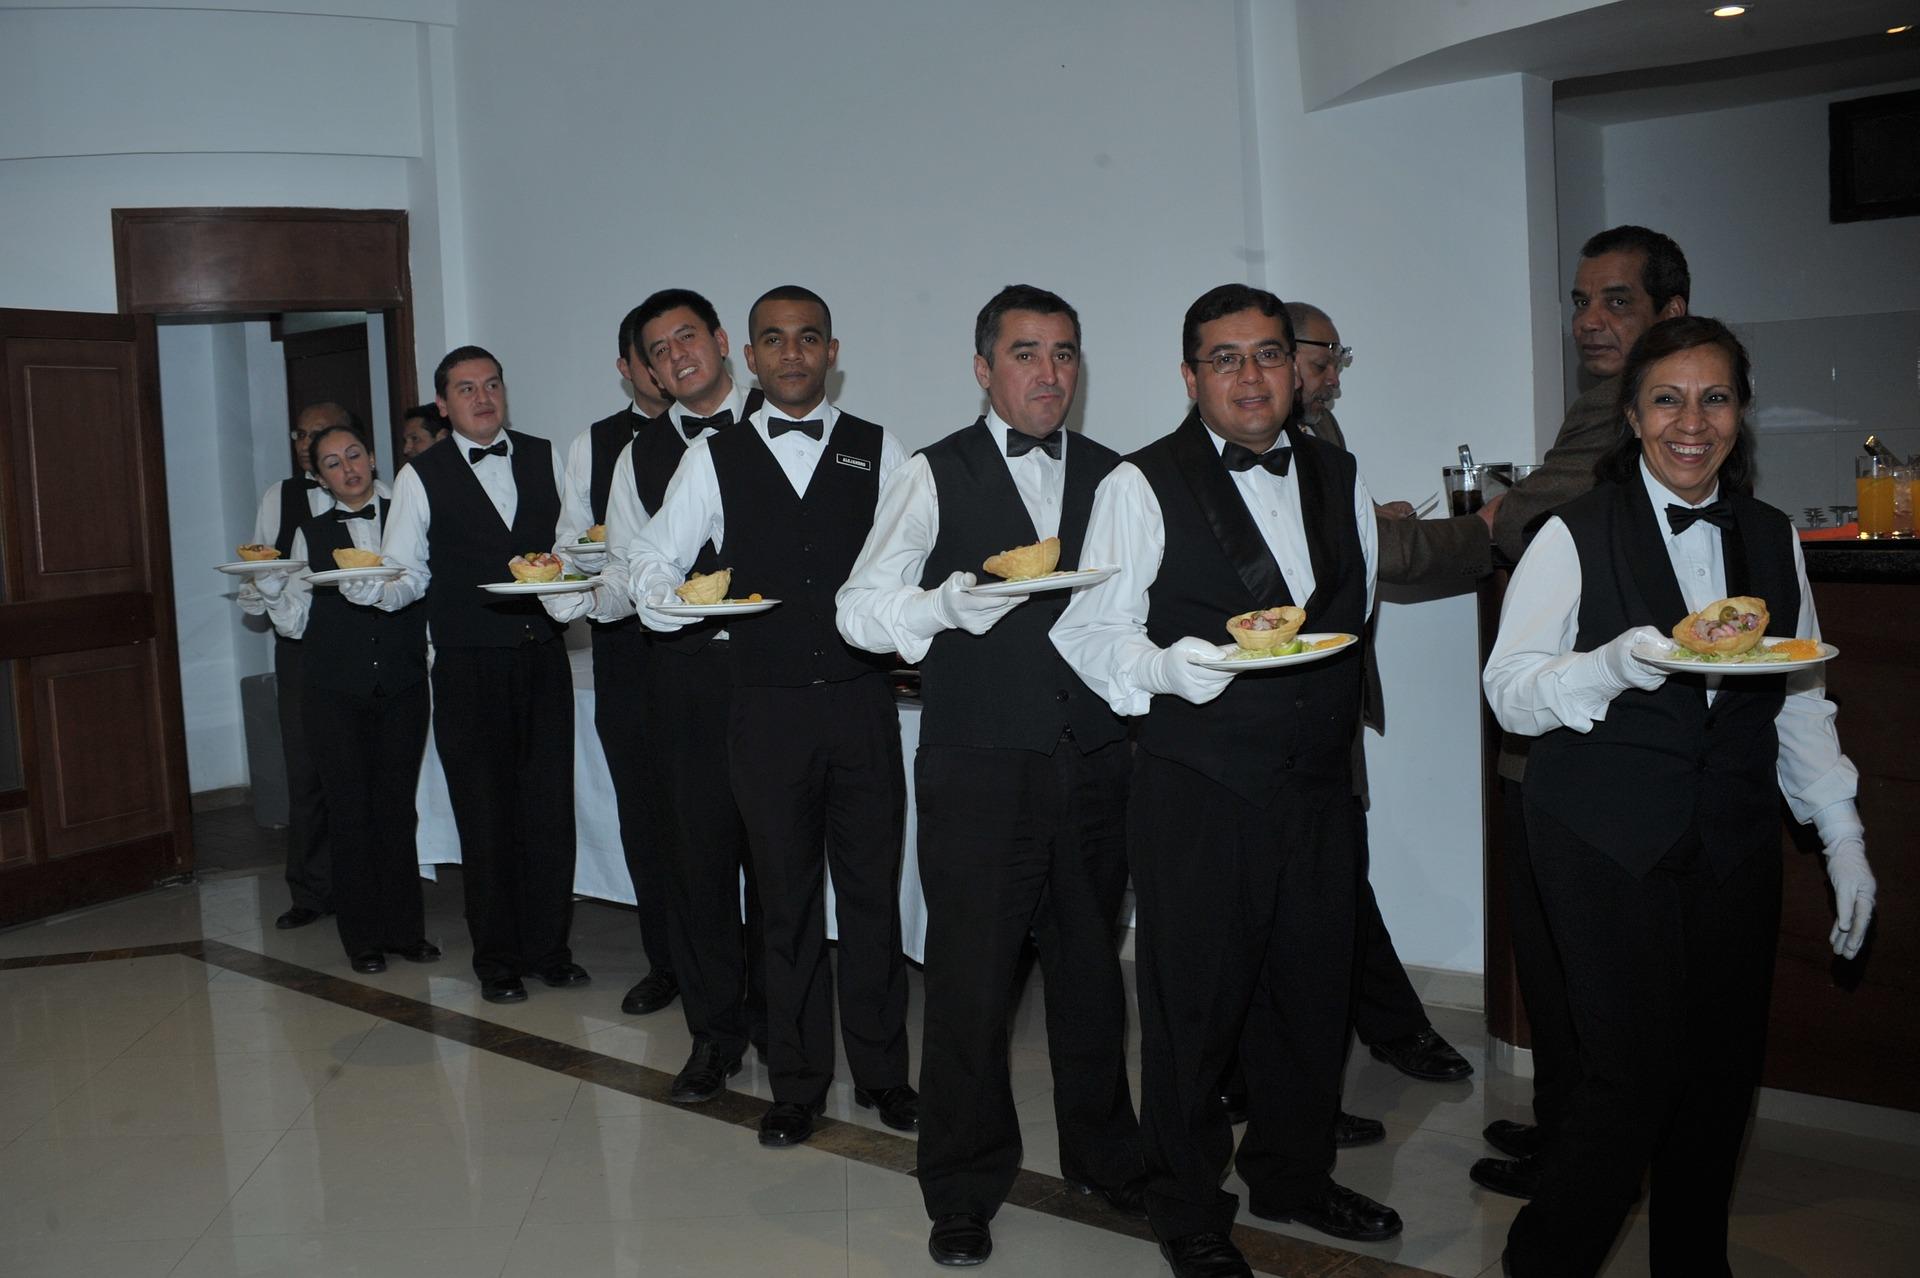 waiters-668405_1920.jpg